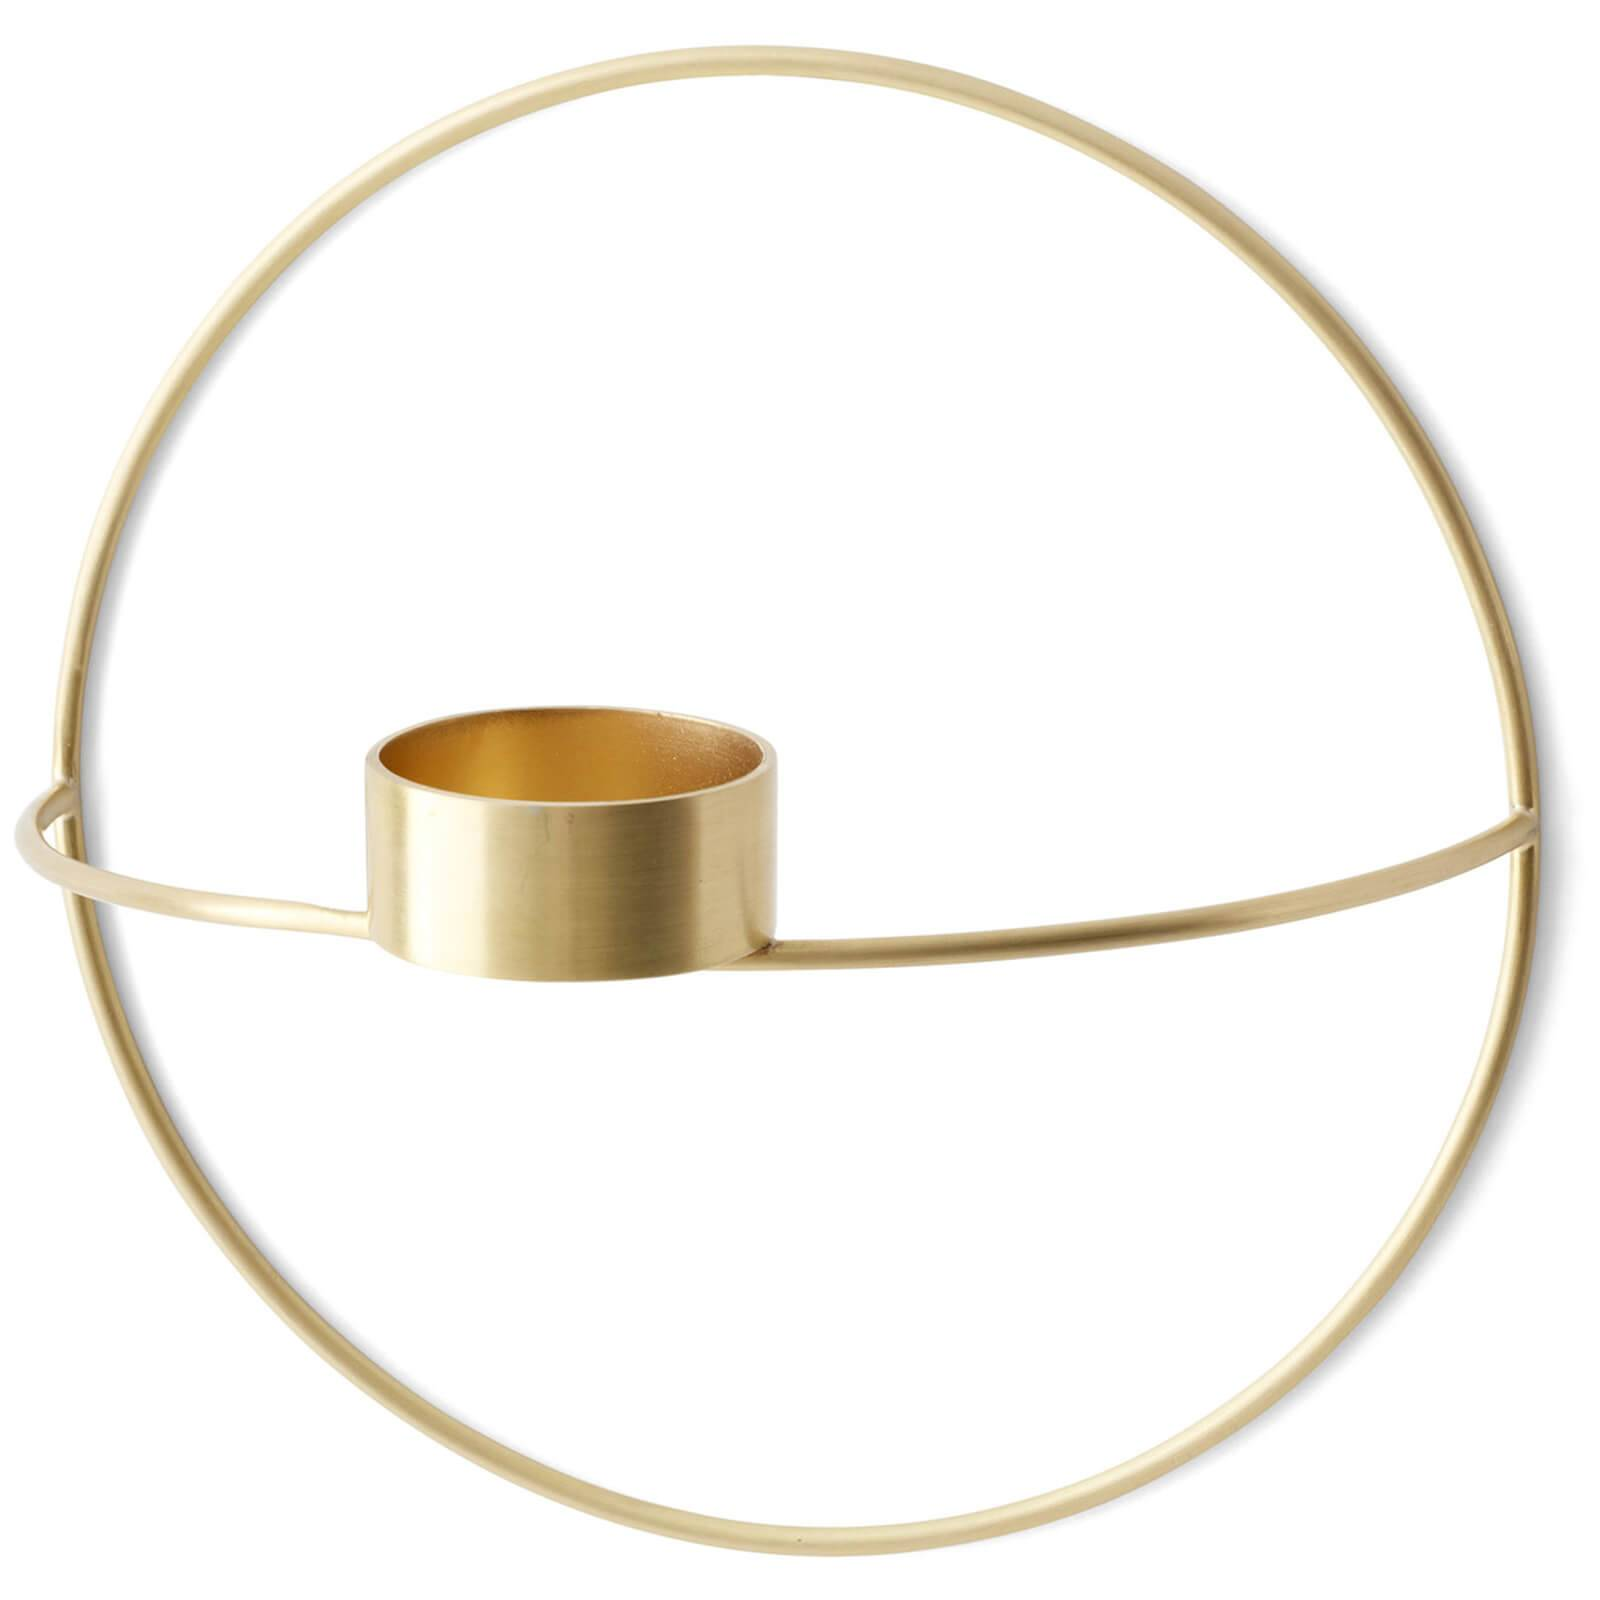 Menu POV Circle Tealight Candle Holder - Brass